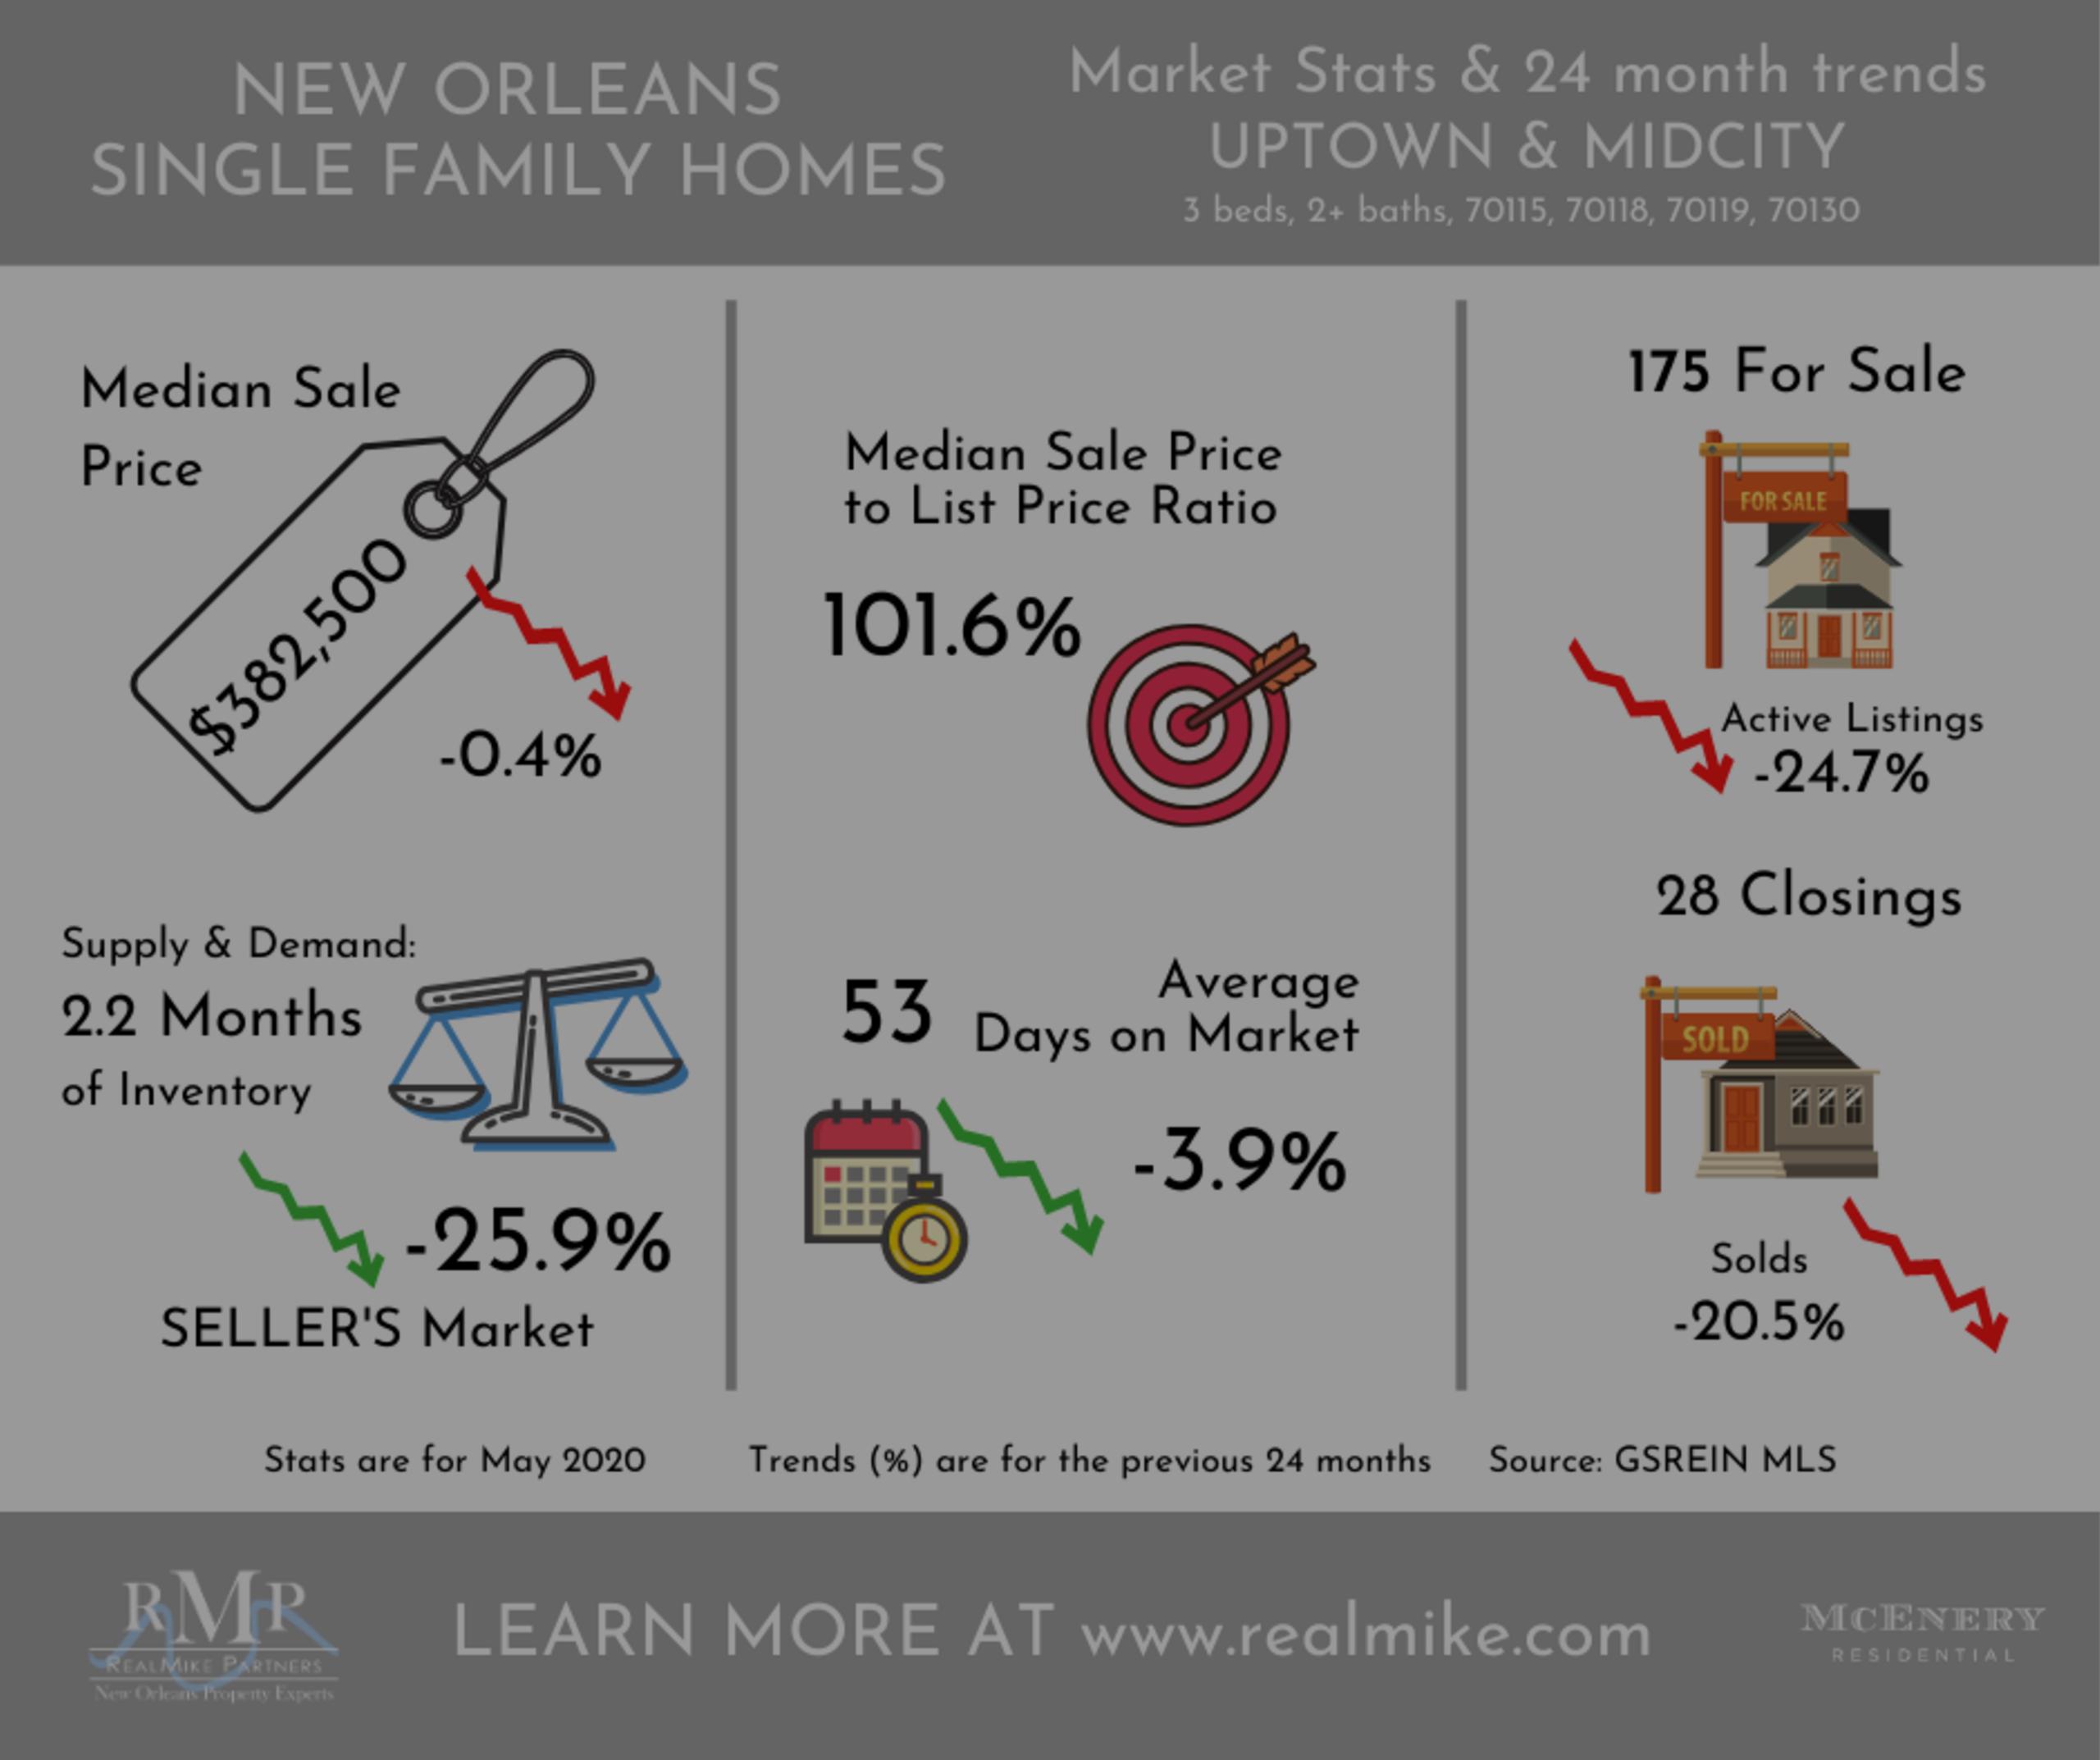 New Orleans Real Estate Market is back despite COVID-19